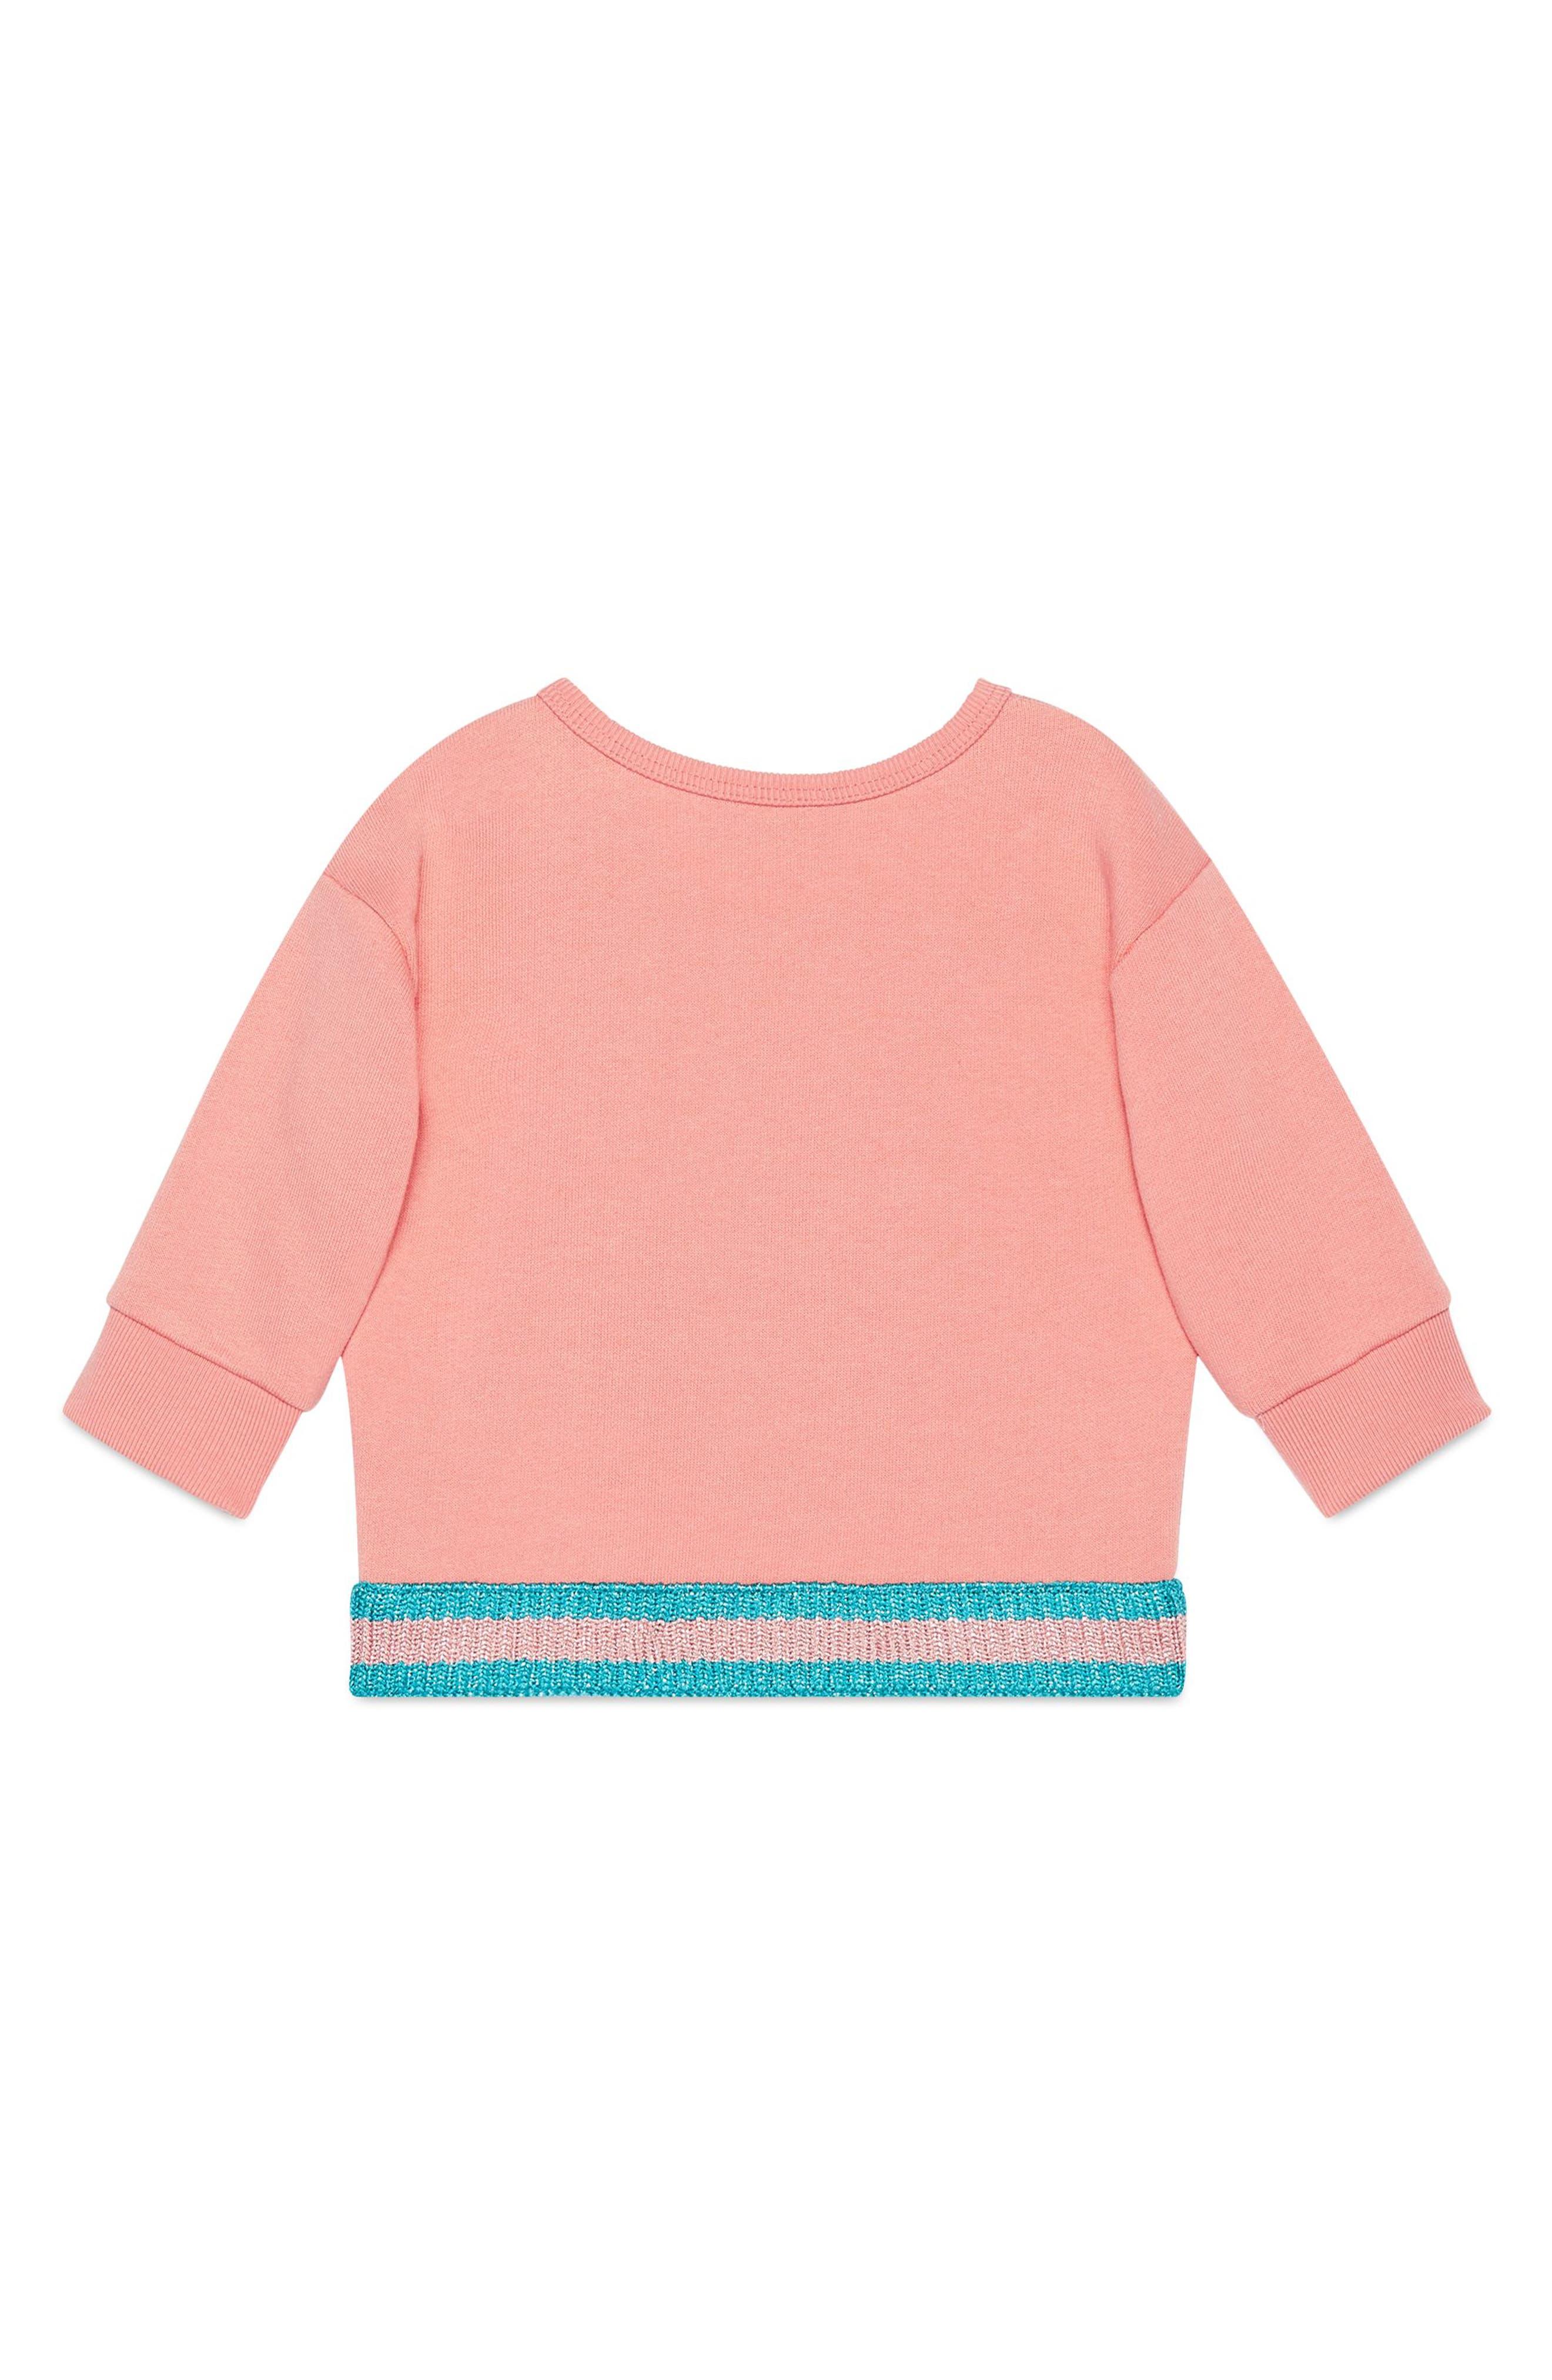 Kitten Graphic Cotton Sweatshirt,                             Alternate thumbnail 2, color,                             662